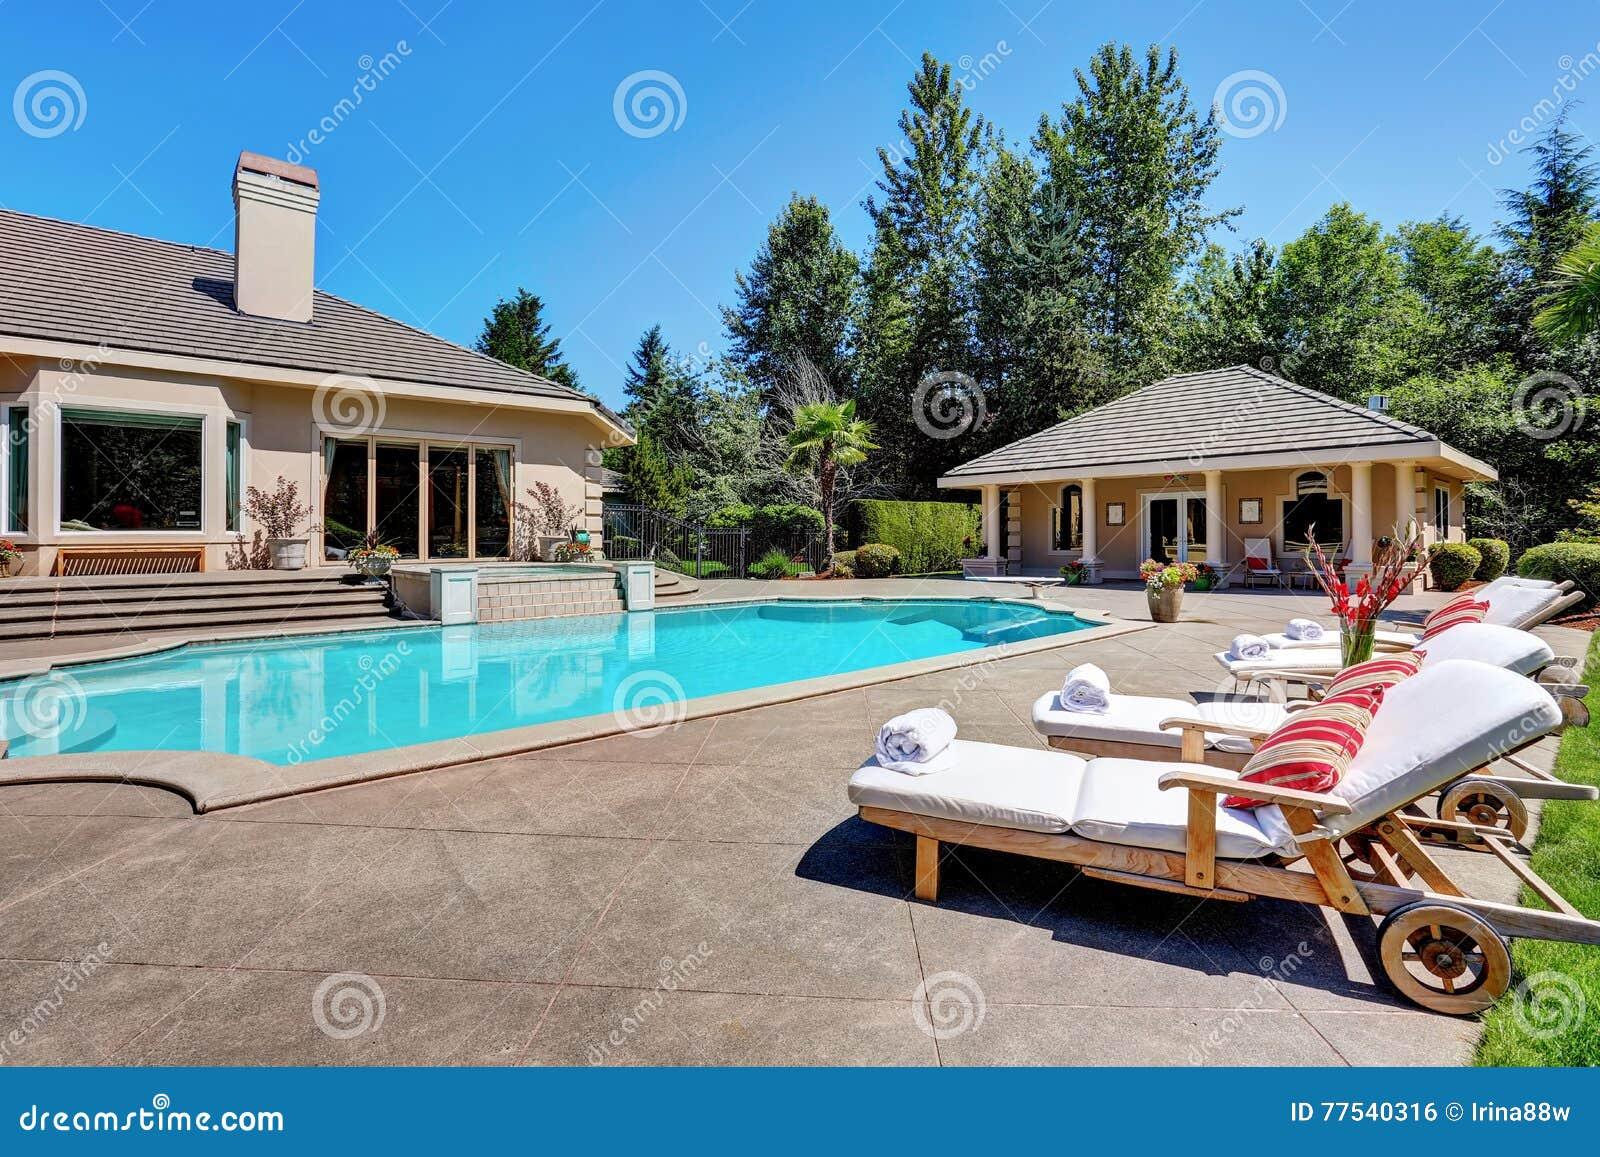 Great Backyard With Swimming Pool American Suburban Luxury House Stock Photo Image Of Door